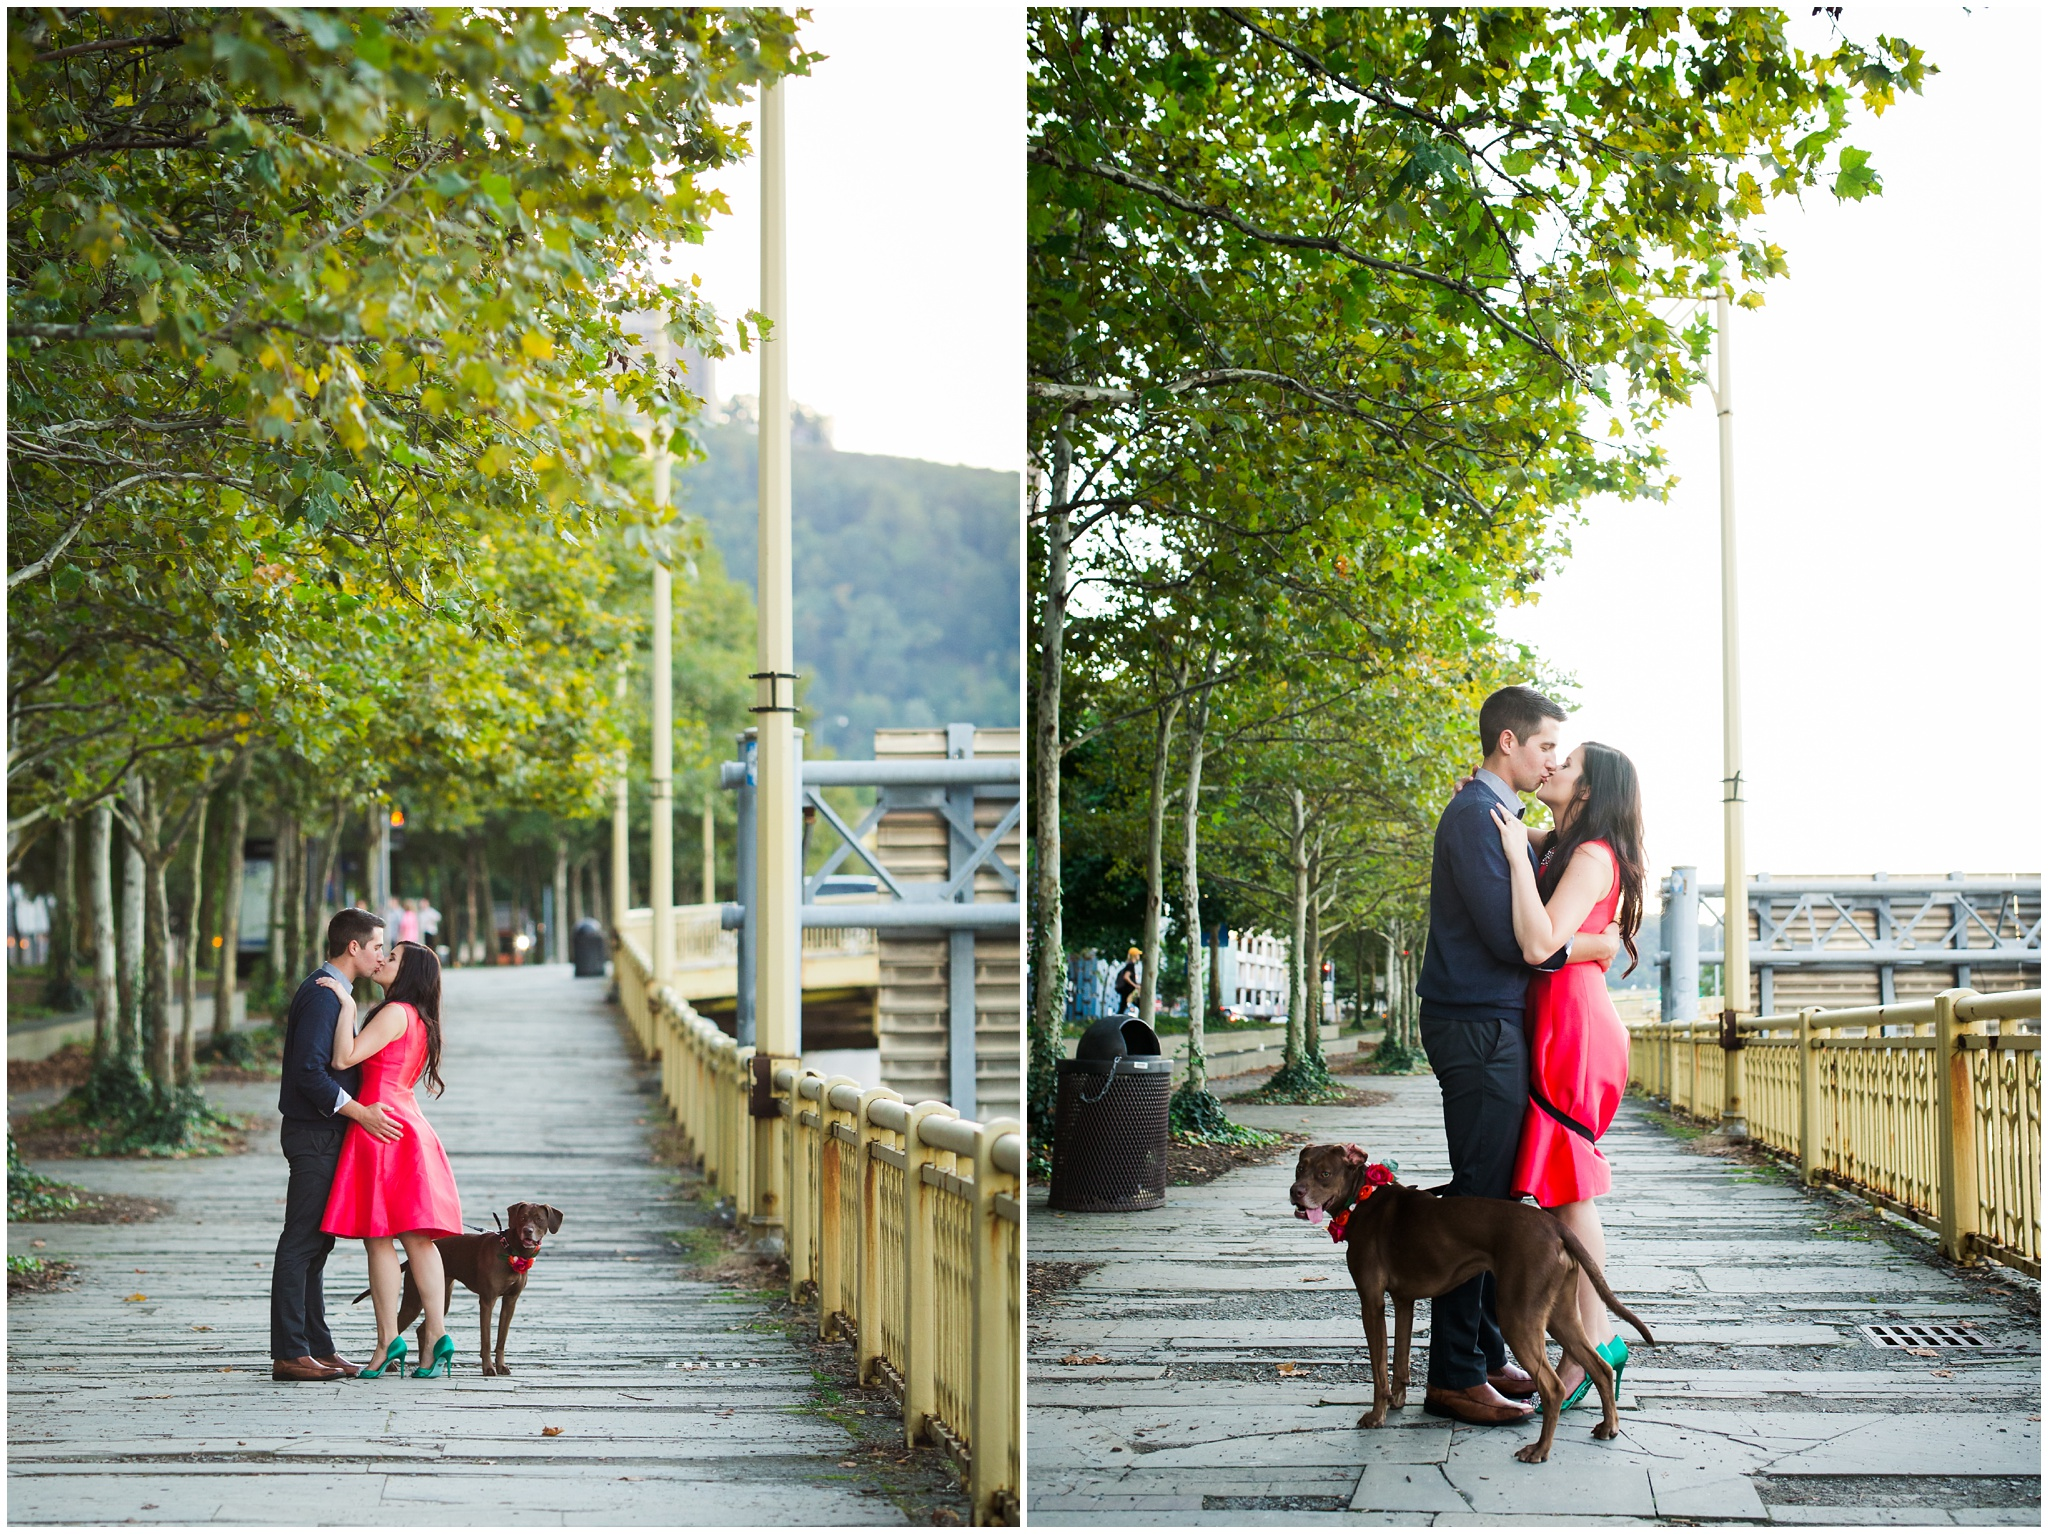 Jeannine_bonadio_photography_engagement_city_session